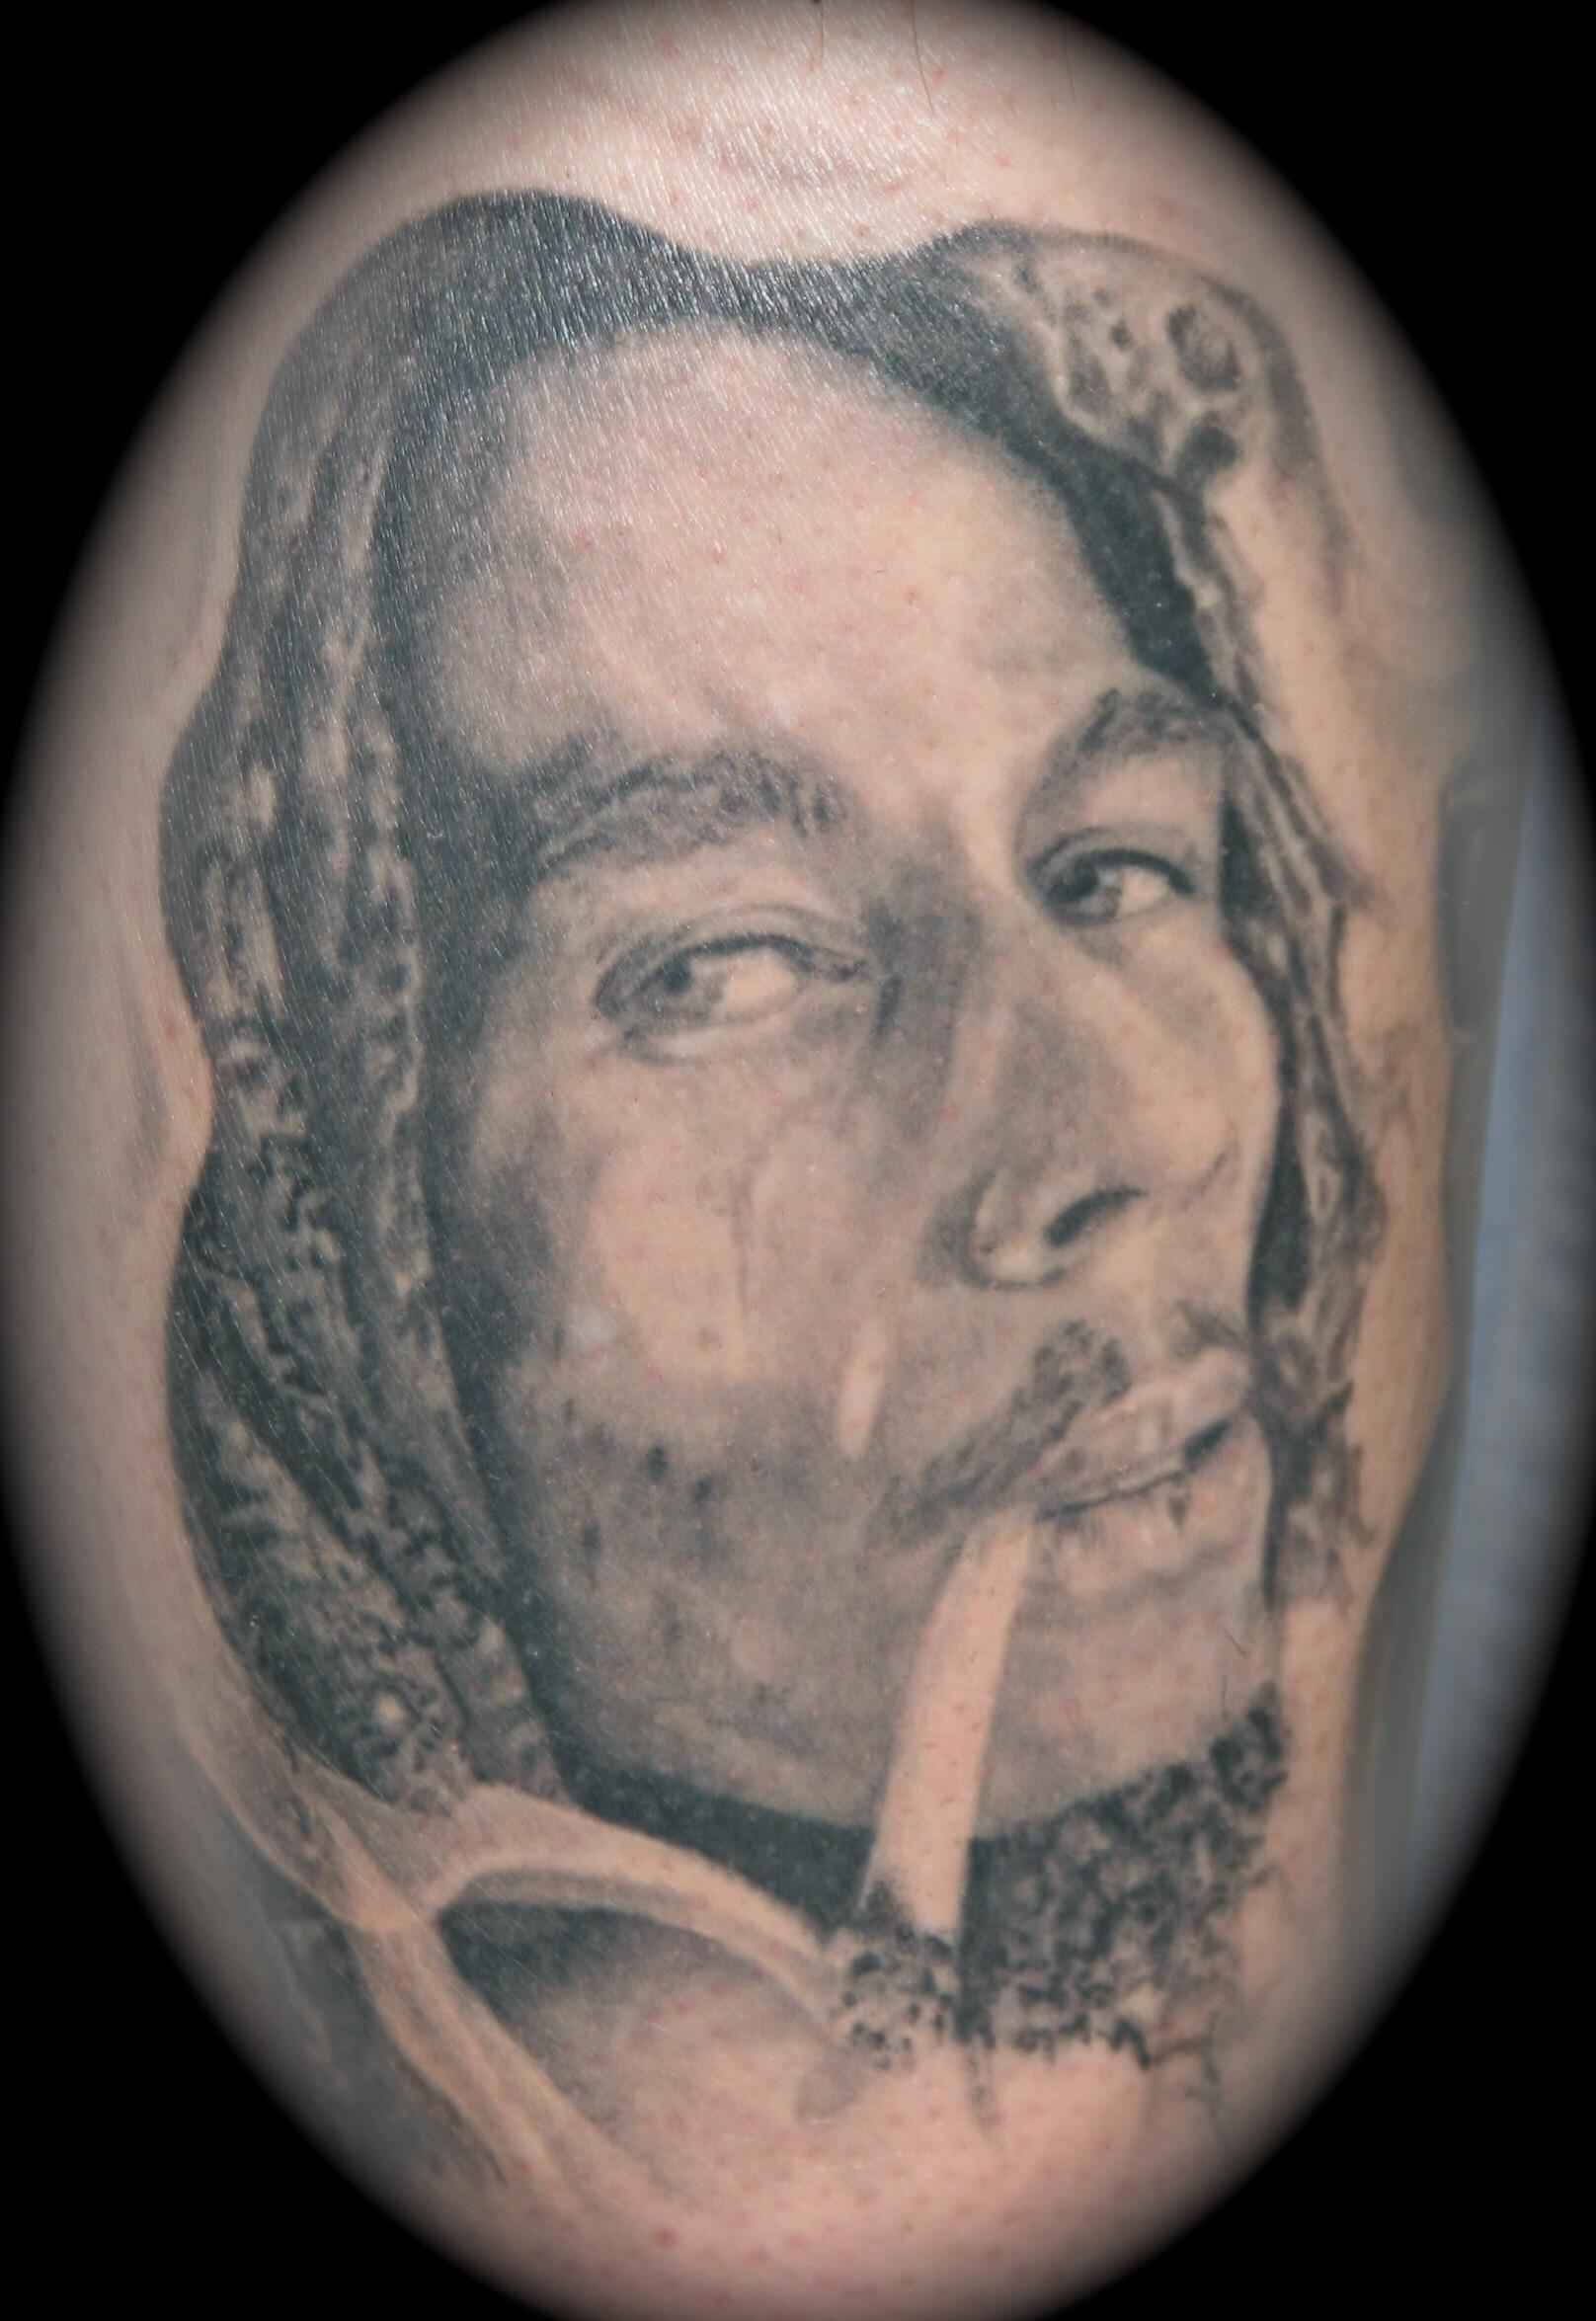 Enchanted Dragon Tattoos | Tattoos | Tattooing | Piercing